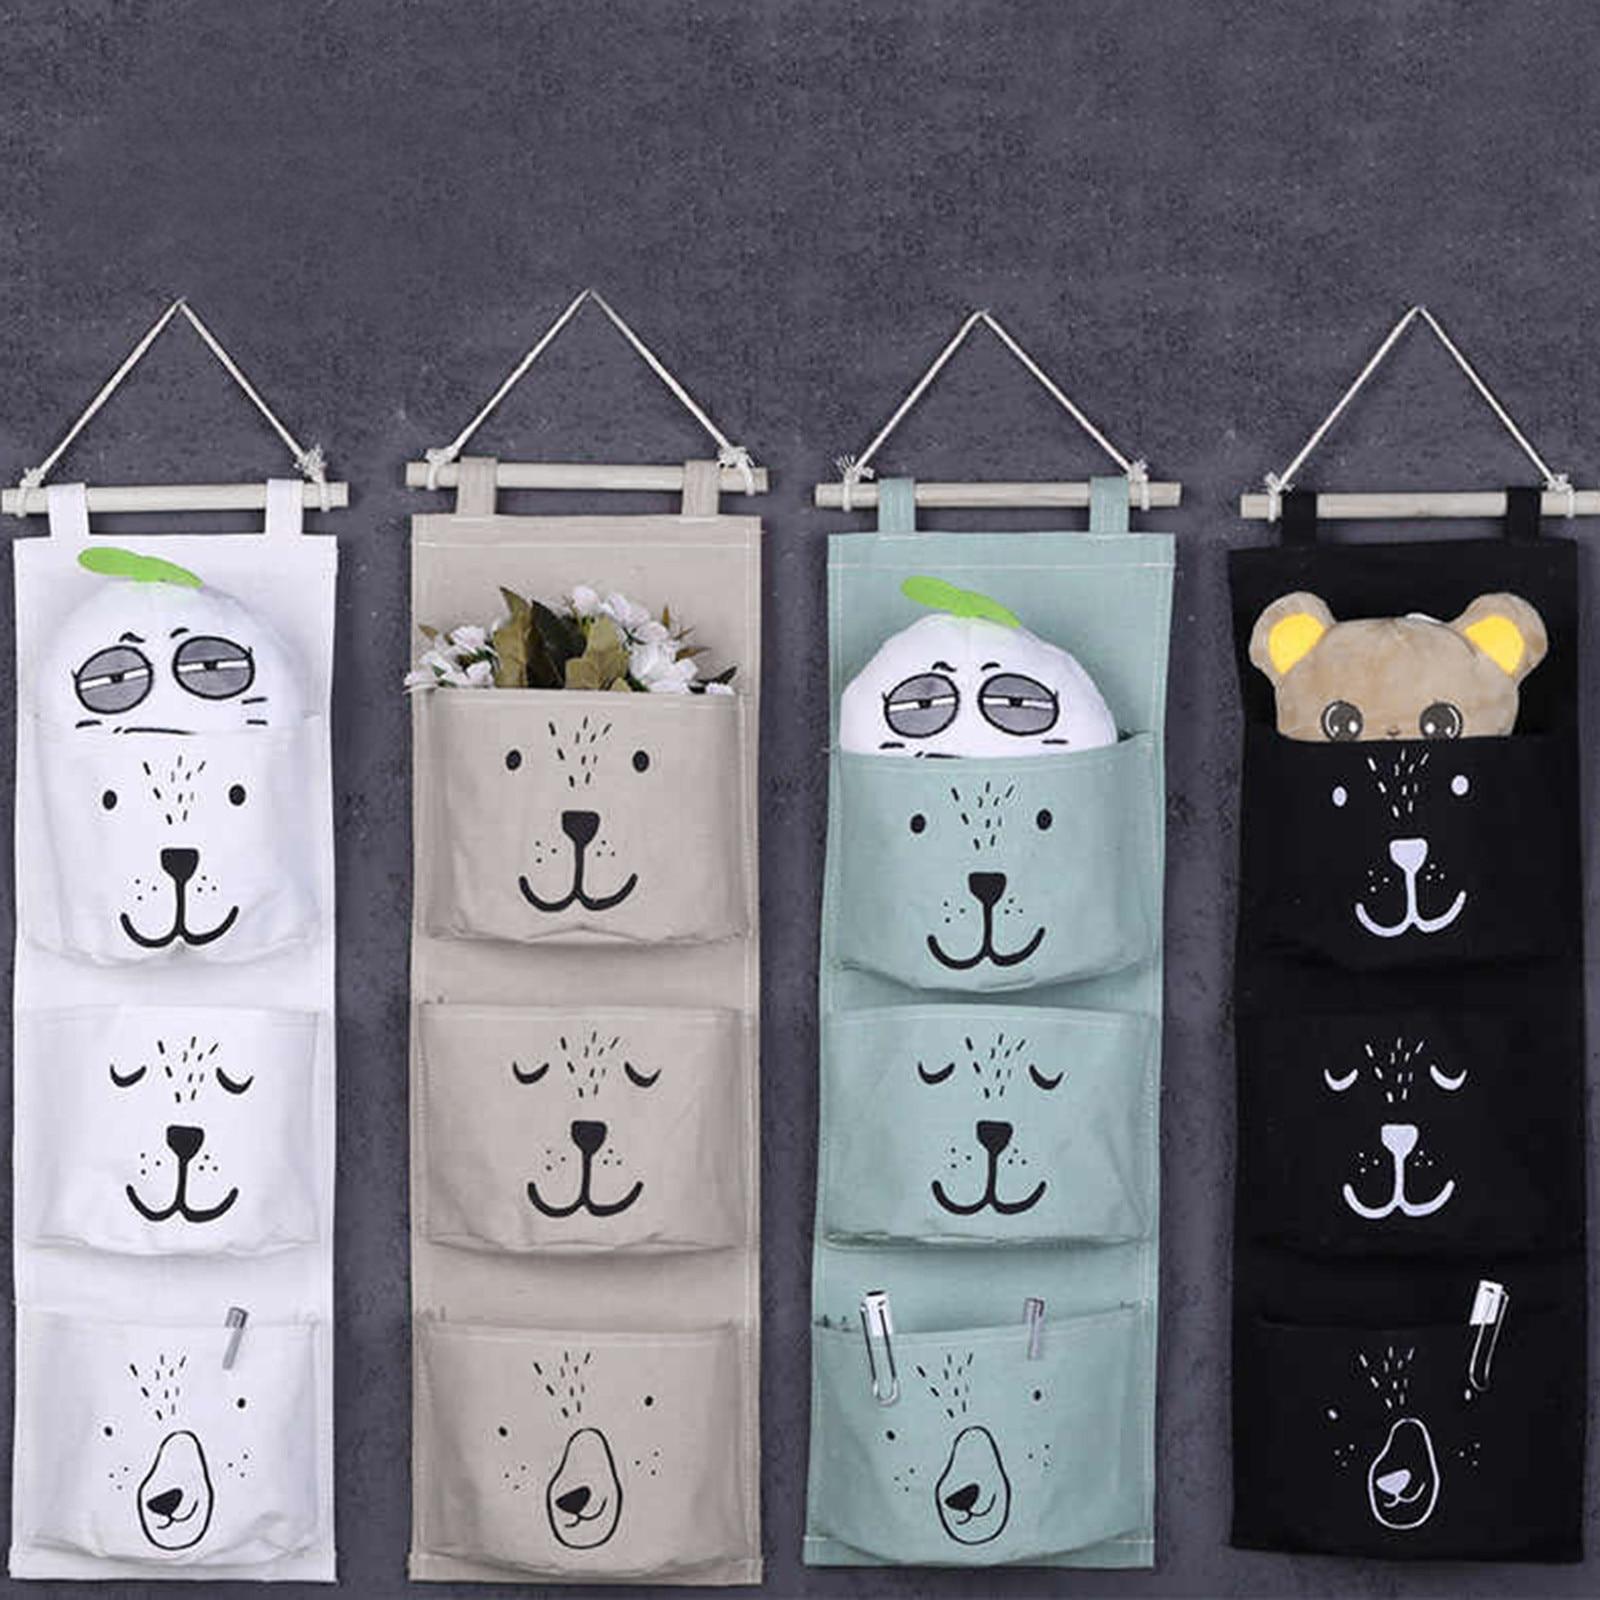 3 Pockets Cute Wall Hanging Storage Bag Linen Clothes Organizer Closet Storage Bag Children Room Organizer Pouch Home Storage ba